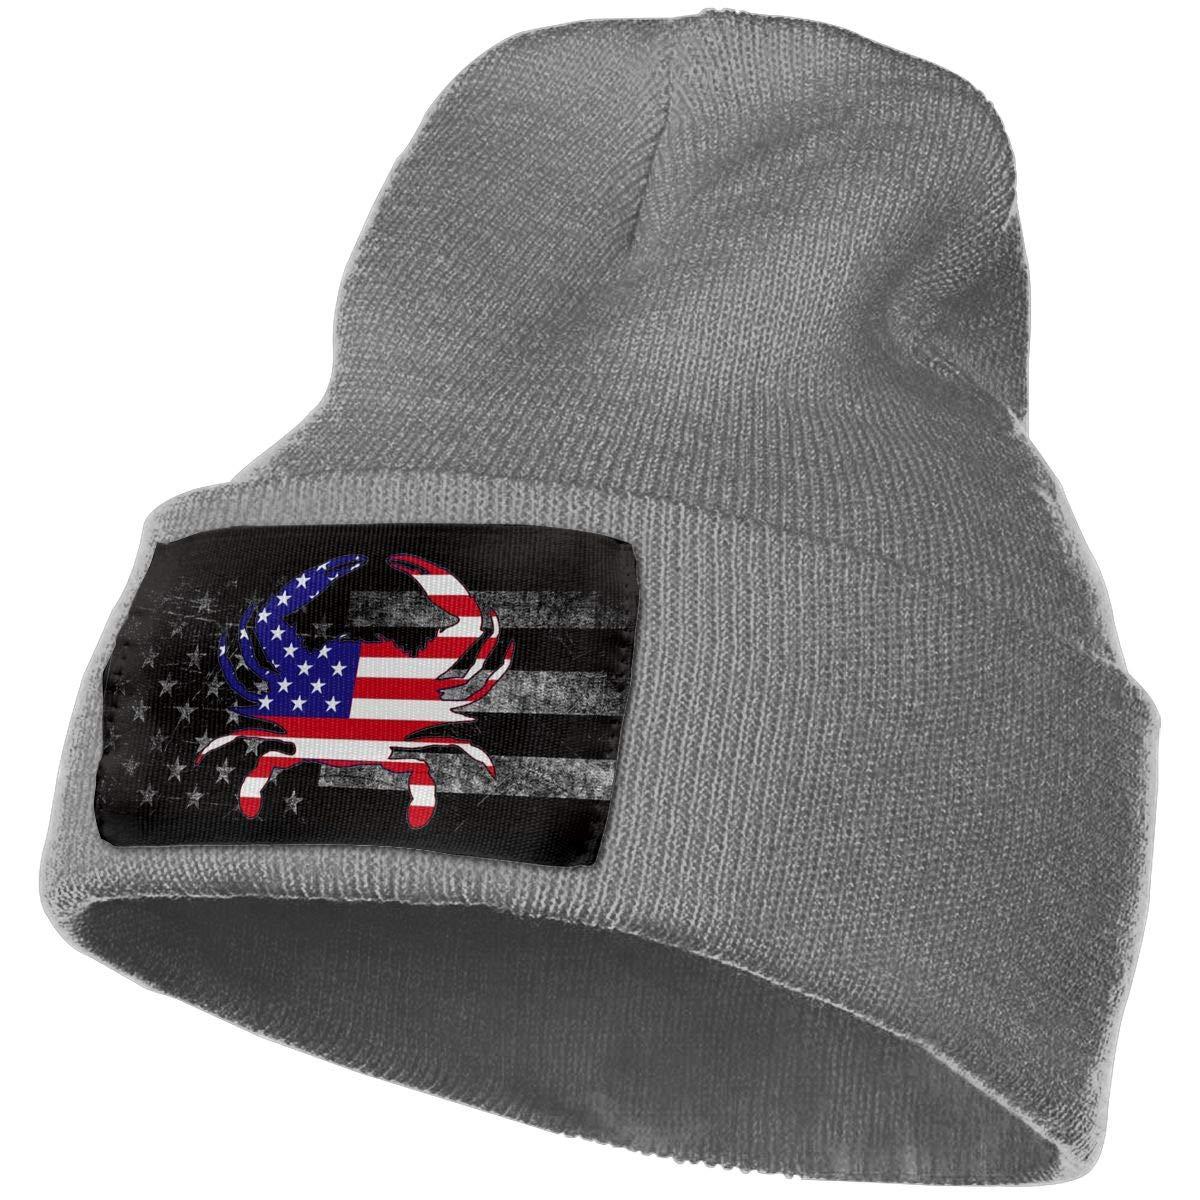 FORDSAN CP America Flag Crab Mens Beanie Cap Skull Cap Winter Warm Knitting Hats.